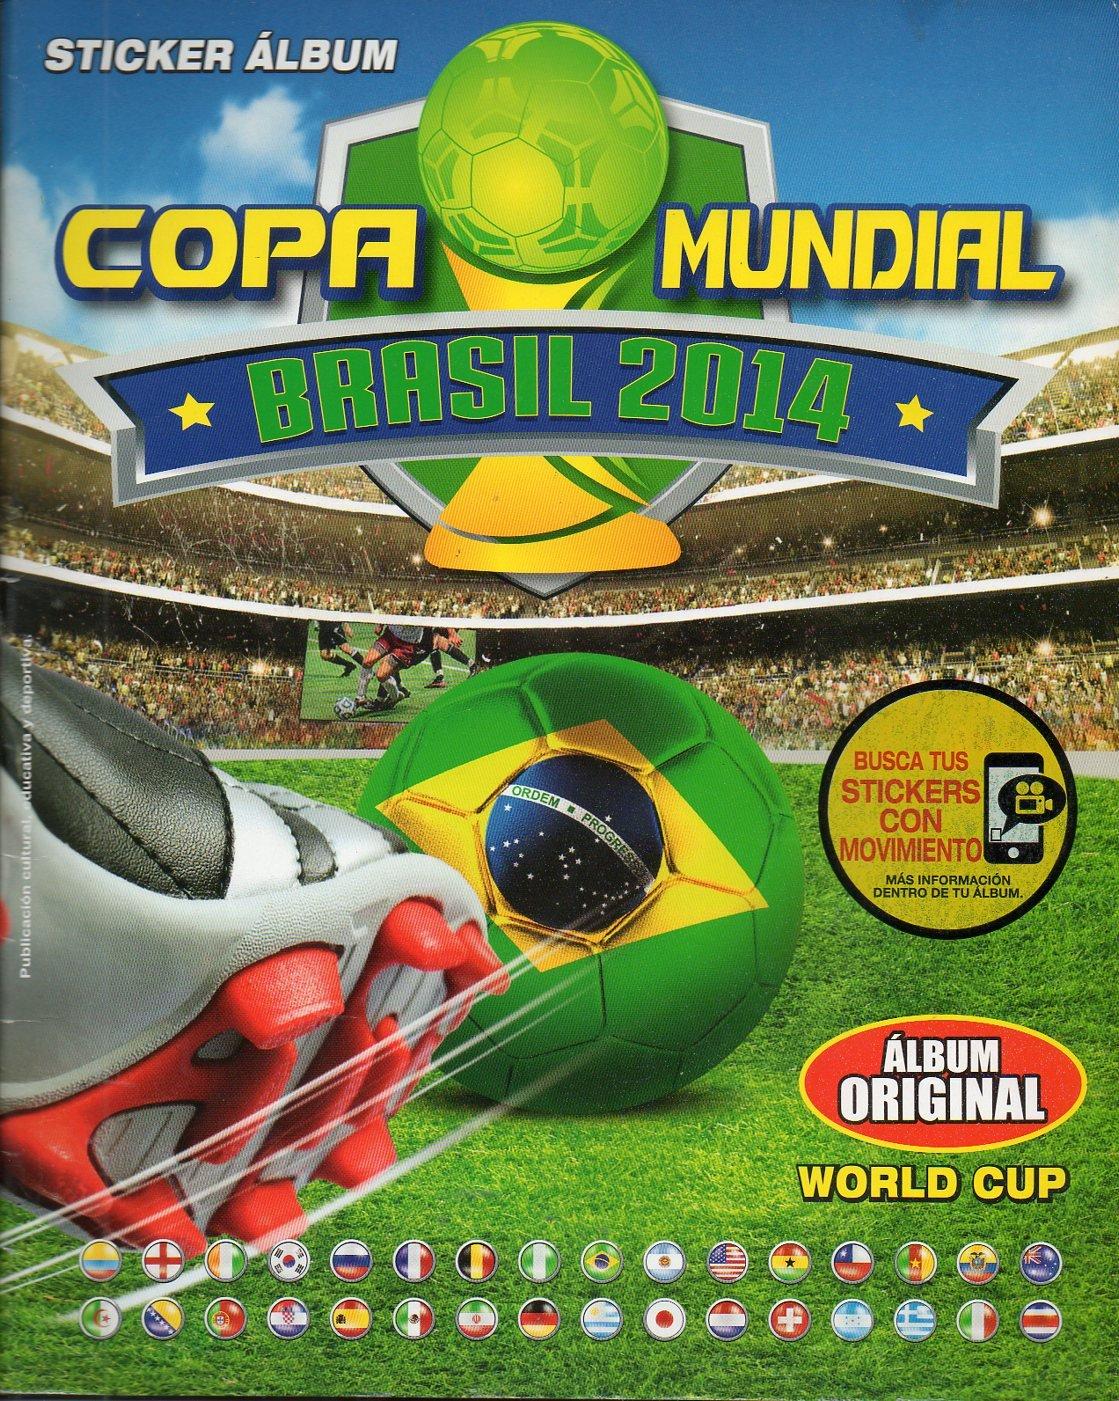 STICKER PERUVIAN ALBUM FUTBOL COPA MUNDIAL BRASIL 2014 FOOTBALL FIFA WORLD CUP BRASIL 2014 NAVARRETE COMPLETE: Amazon.es: Navarrete: Libros